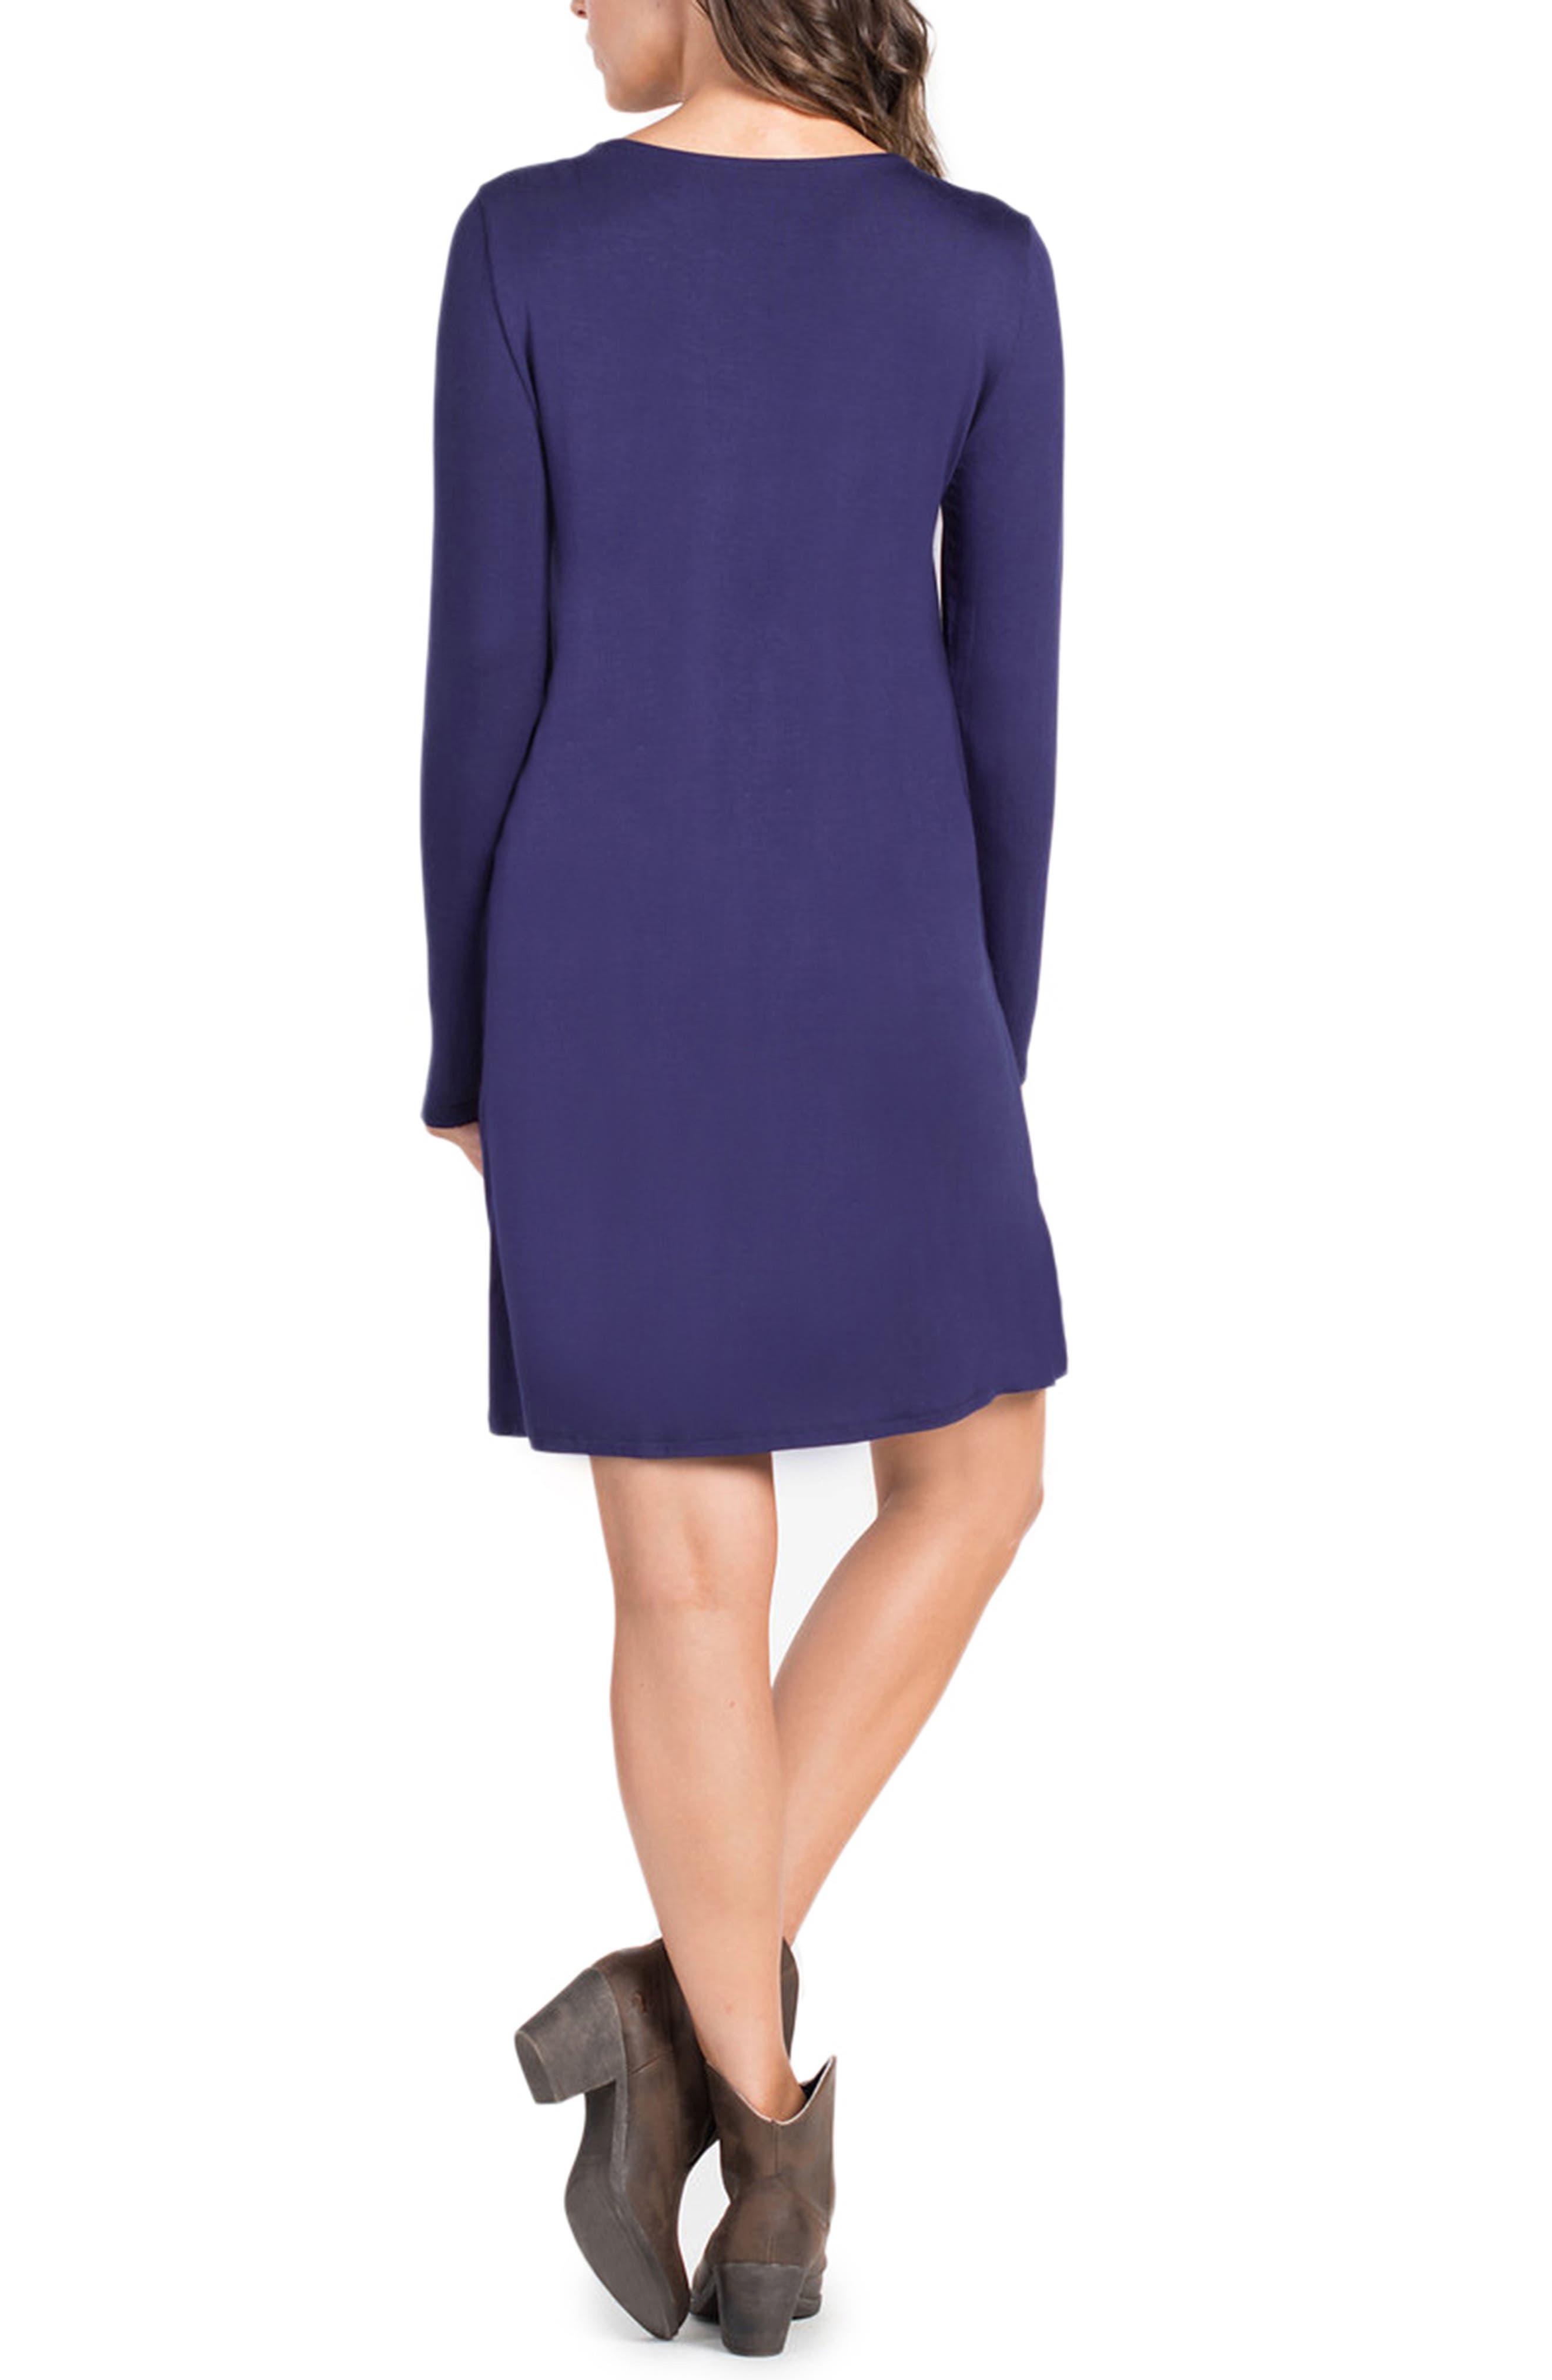 Lenox Crossover Front Maternity/Nursing Dress,                             Alternate thumbnail 2, color,                             Navy/ Olive